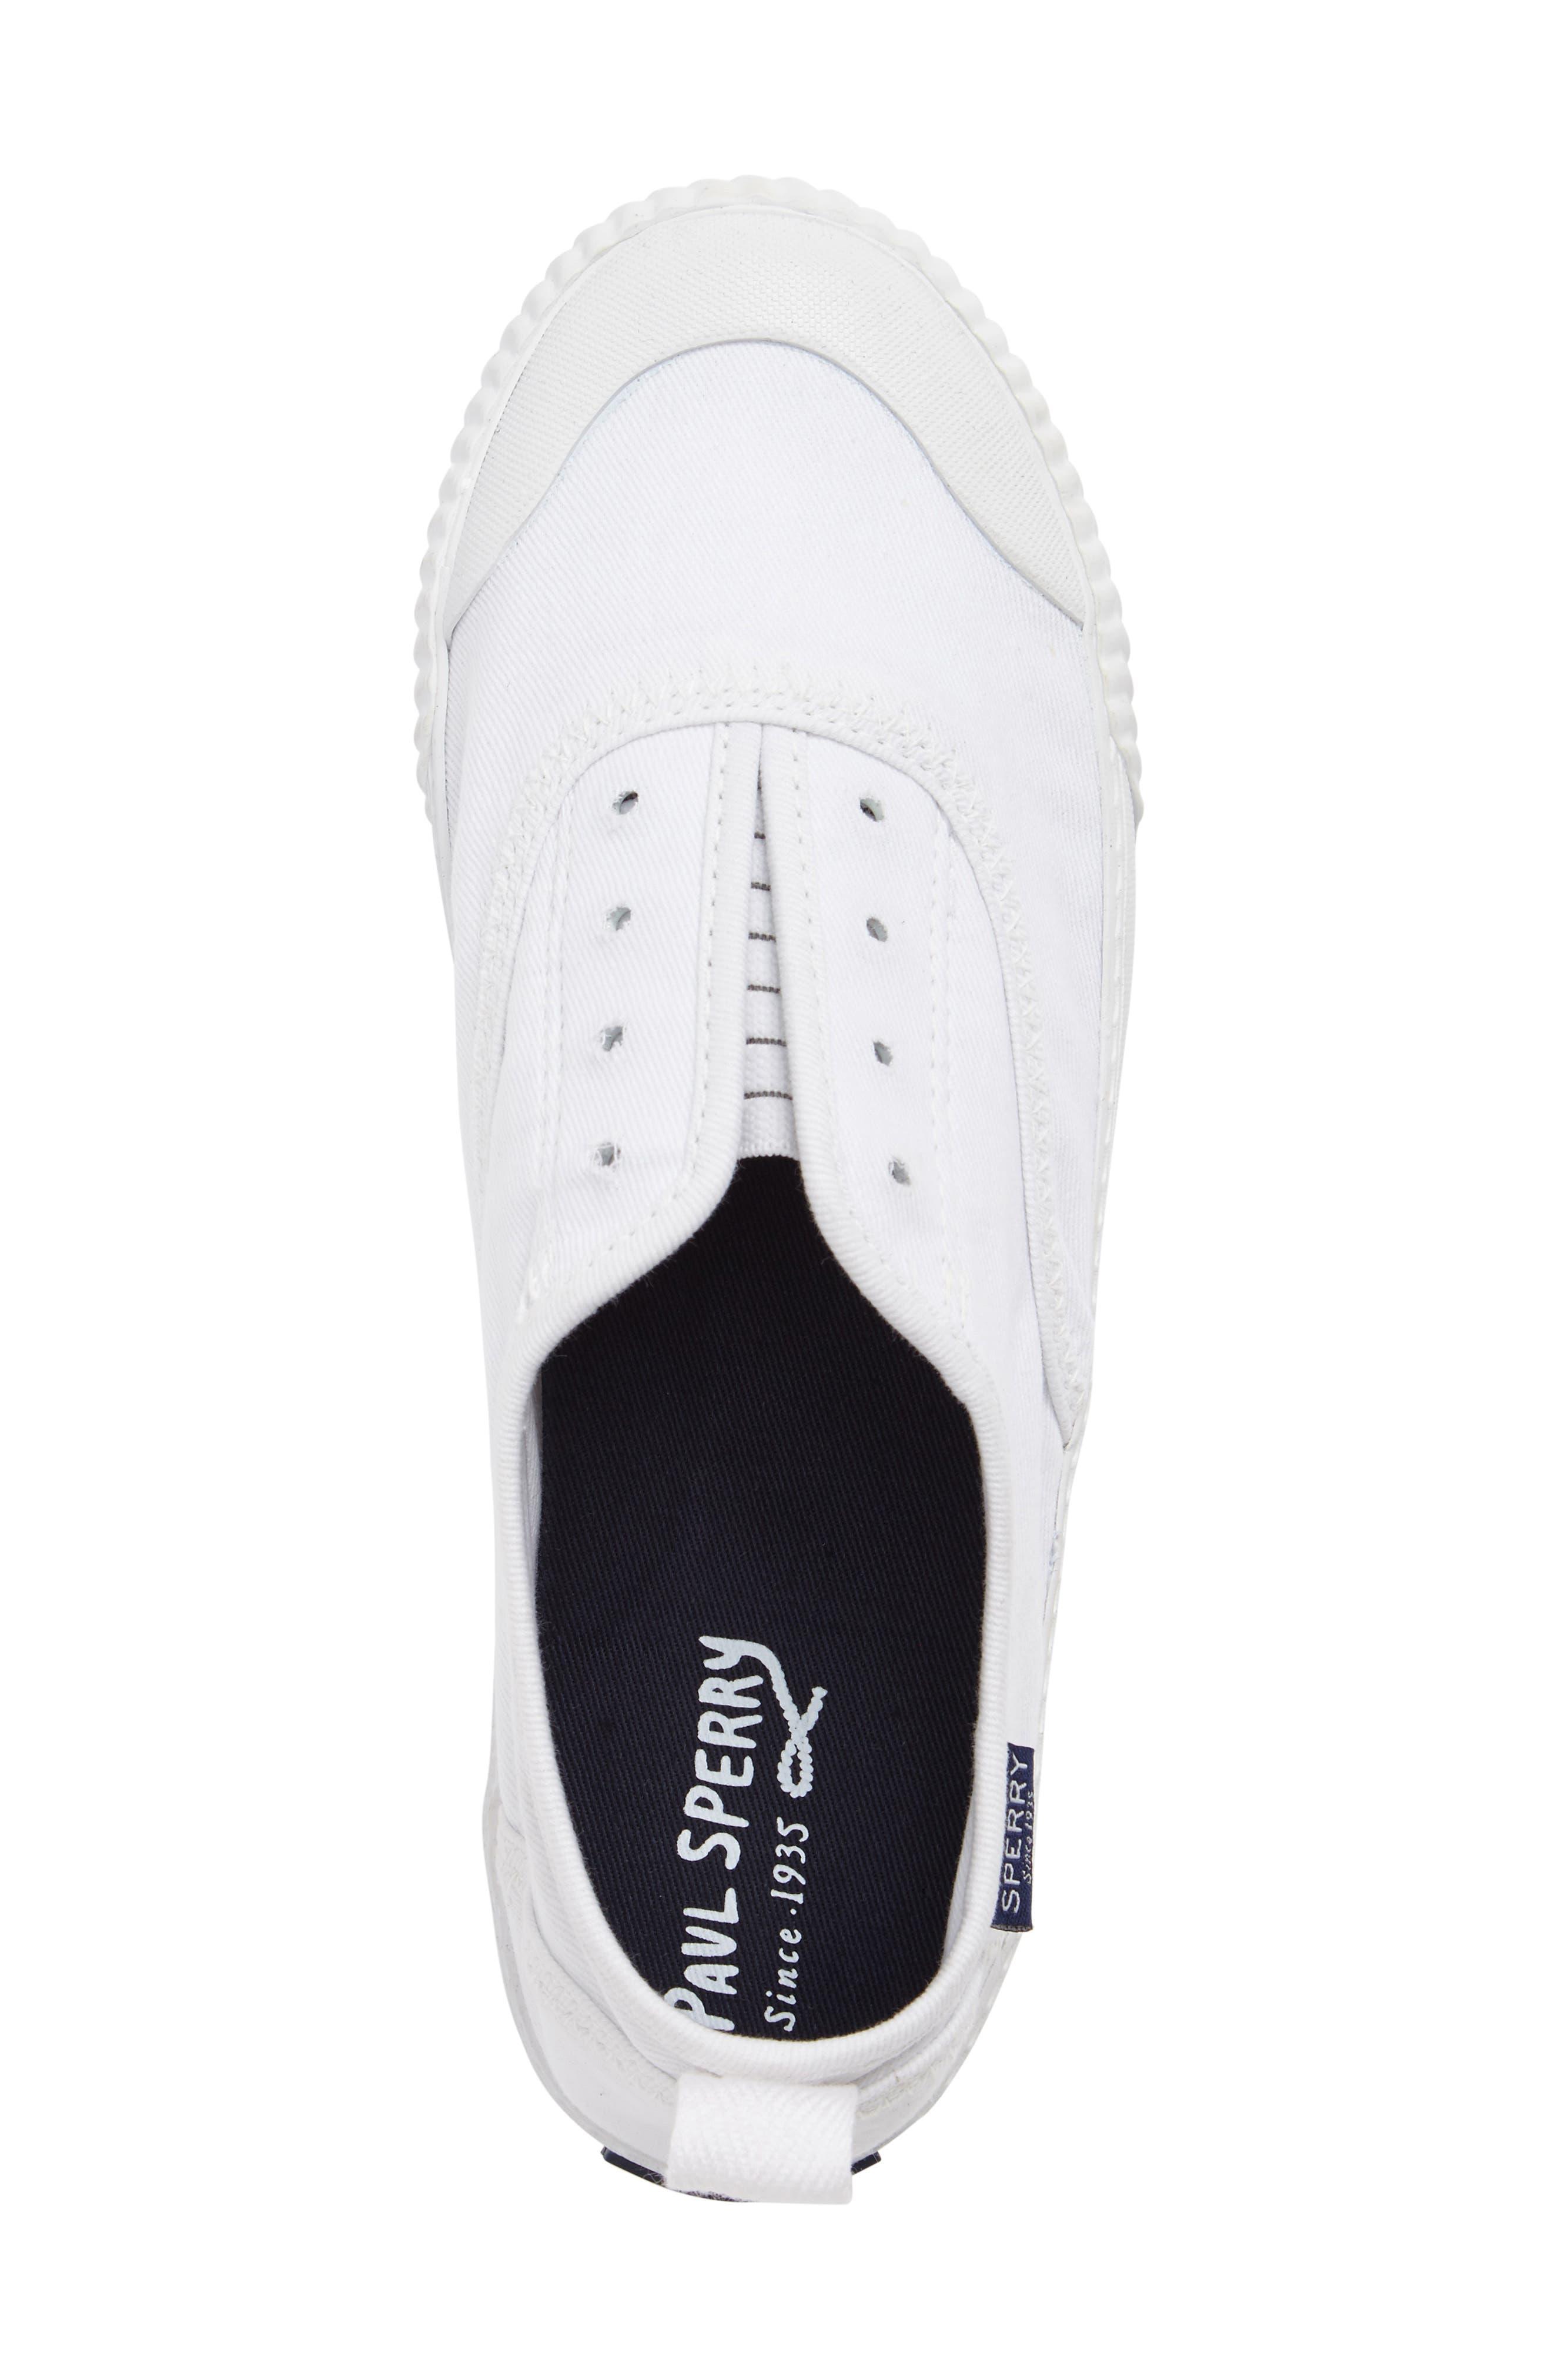 Sayel Slip-On Sneaker,                             Alternate thumbnail 5, color,                             White Fabric